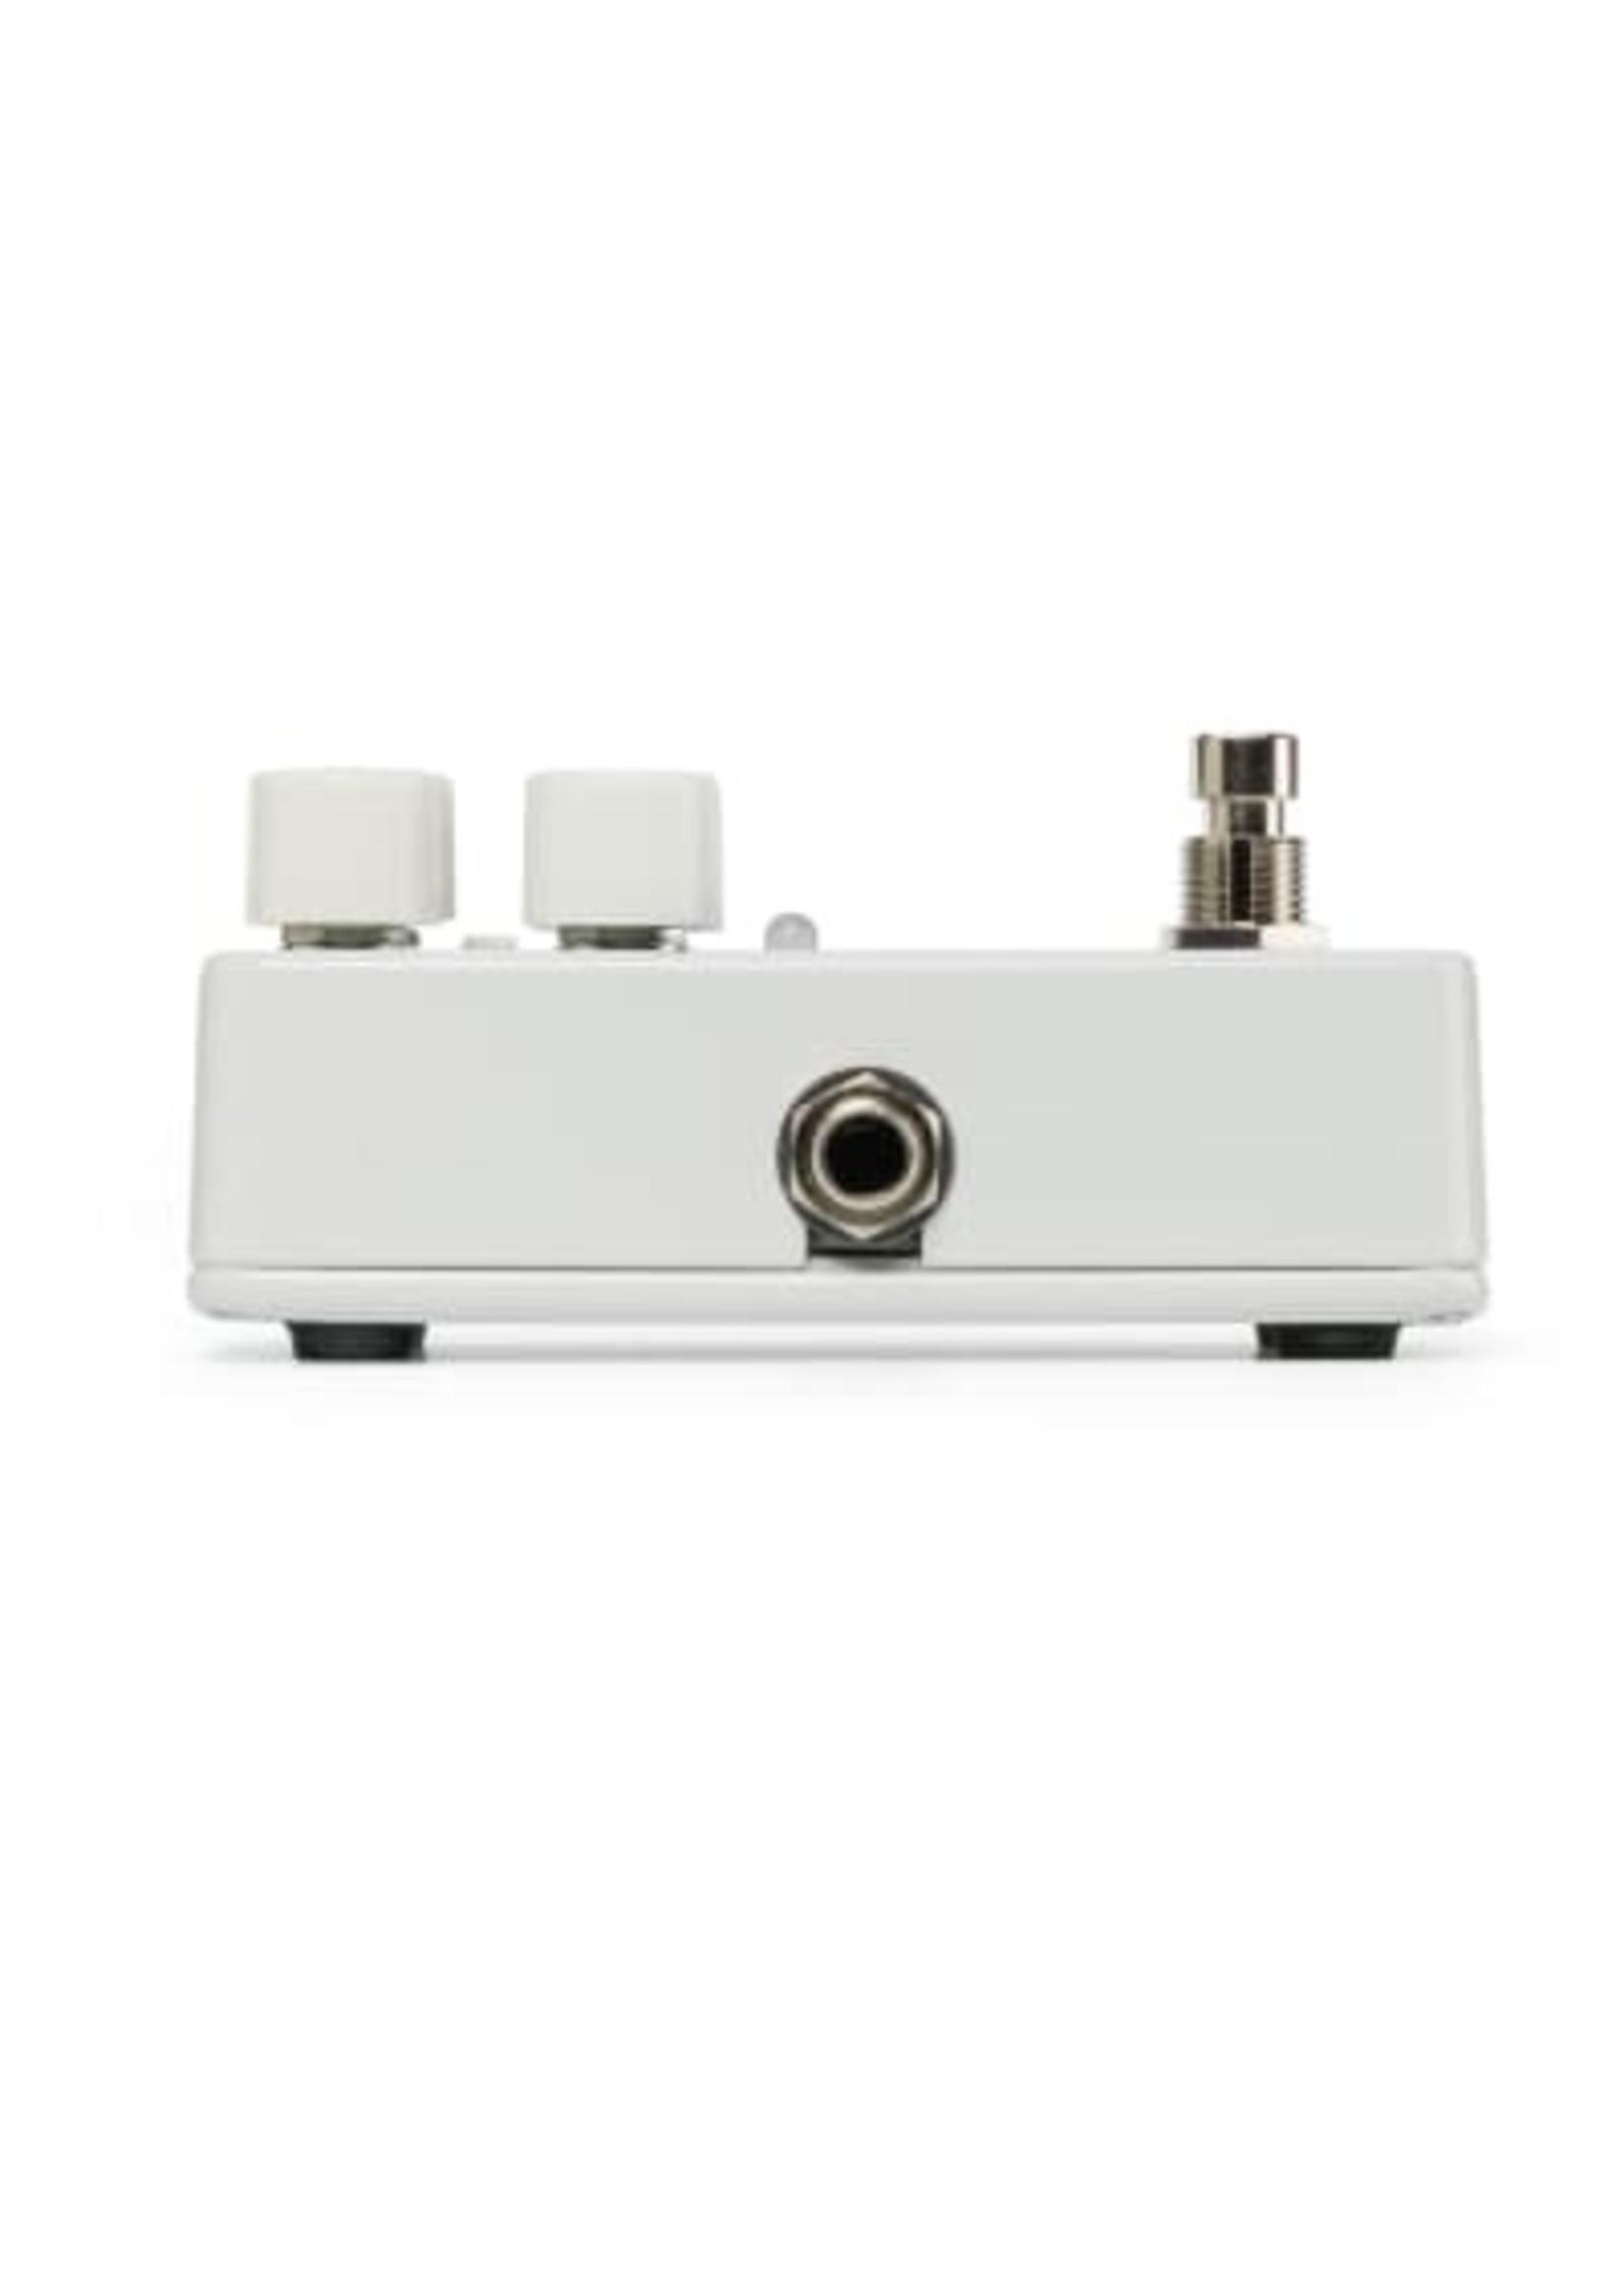 Electro-Harmonix Electro-Harmonix Mod 11 Modulator Pedal